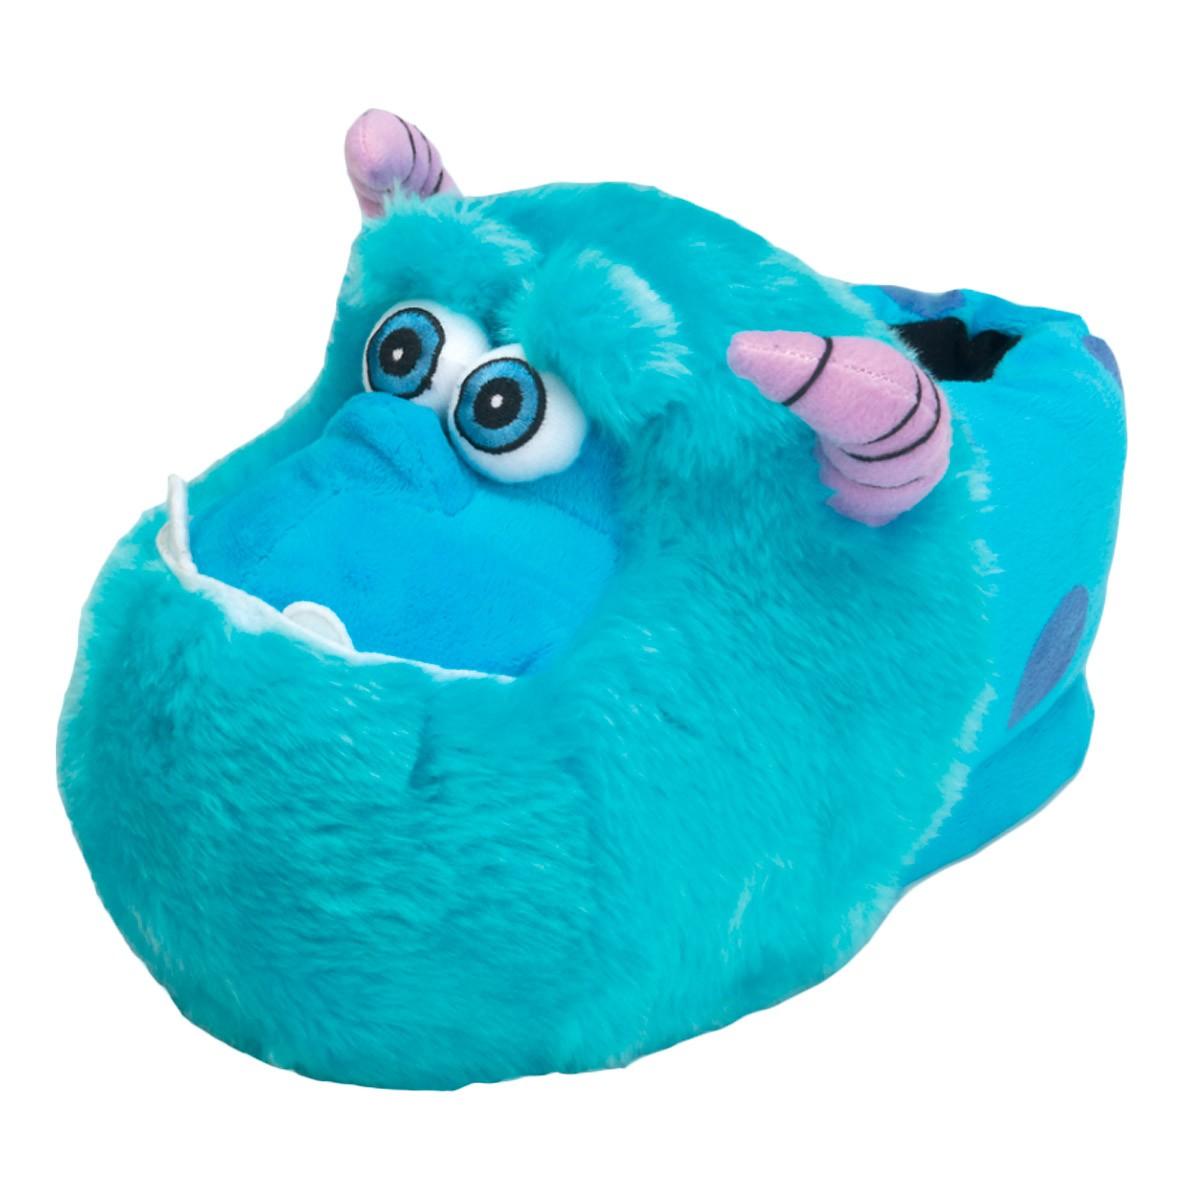 407407945c Bizz Store - Pantufa Ricsen Sulley 3D Unissex Pelúcia Azul